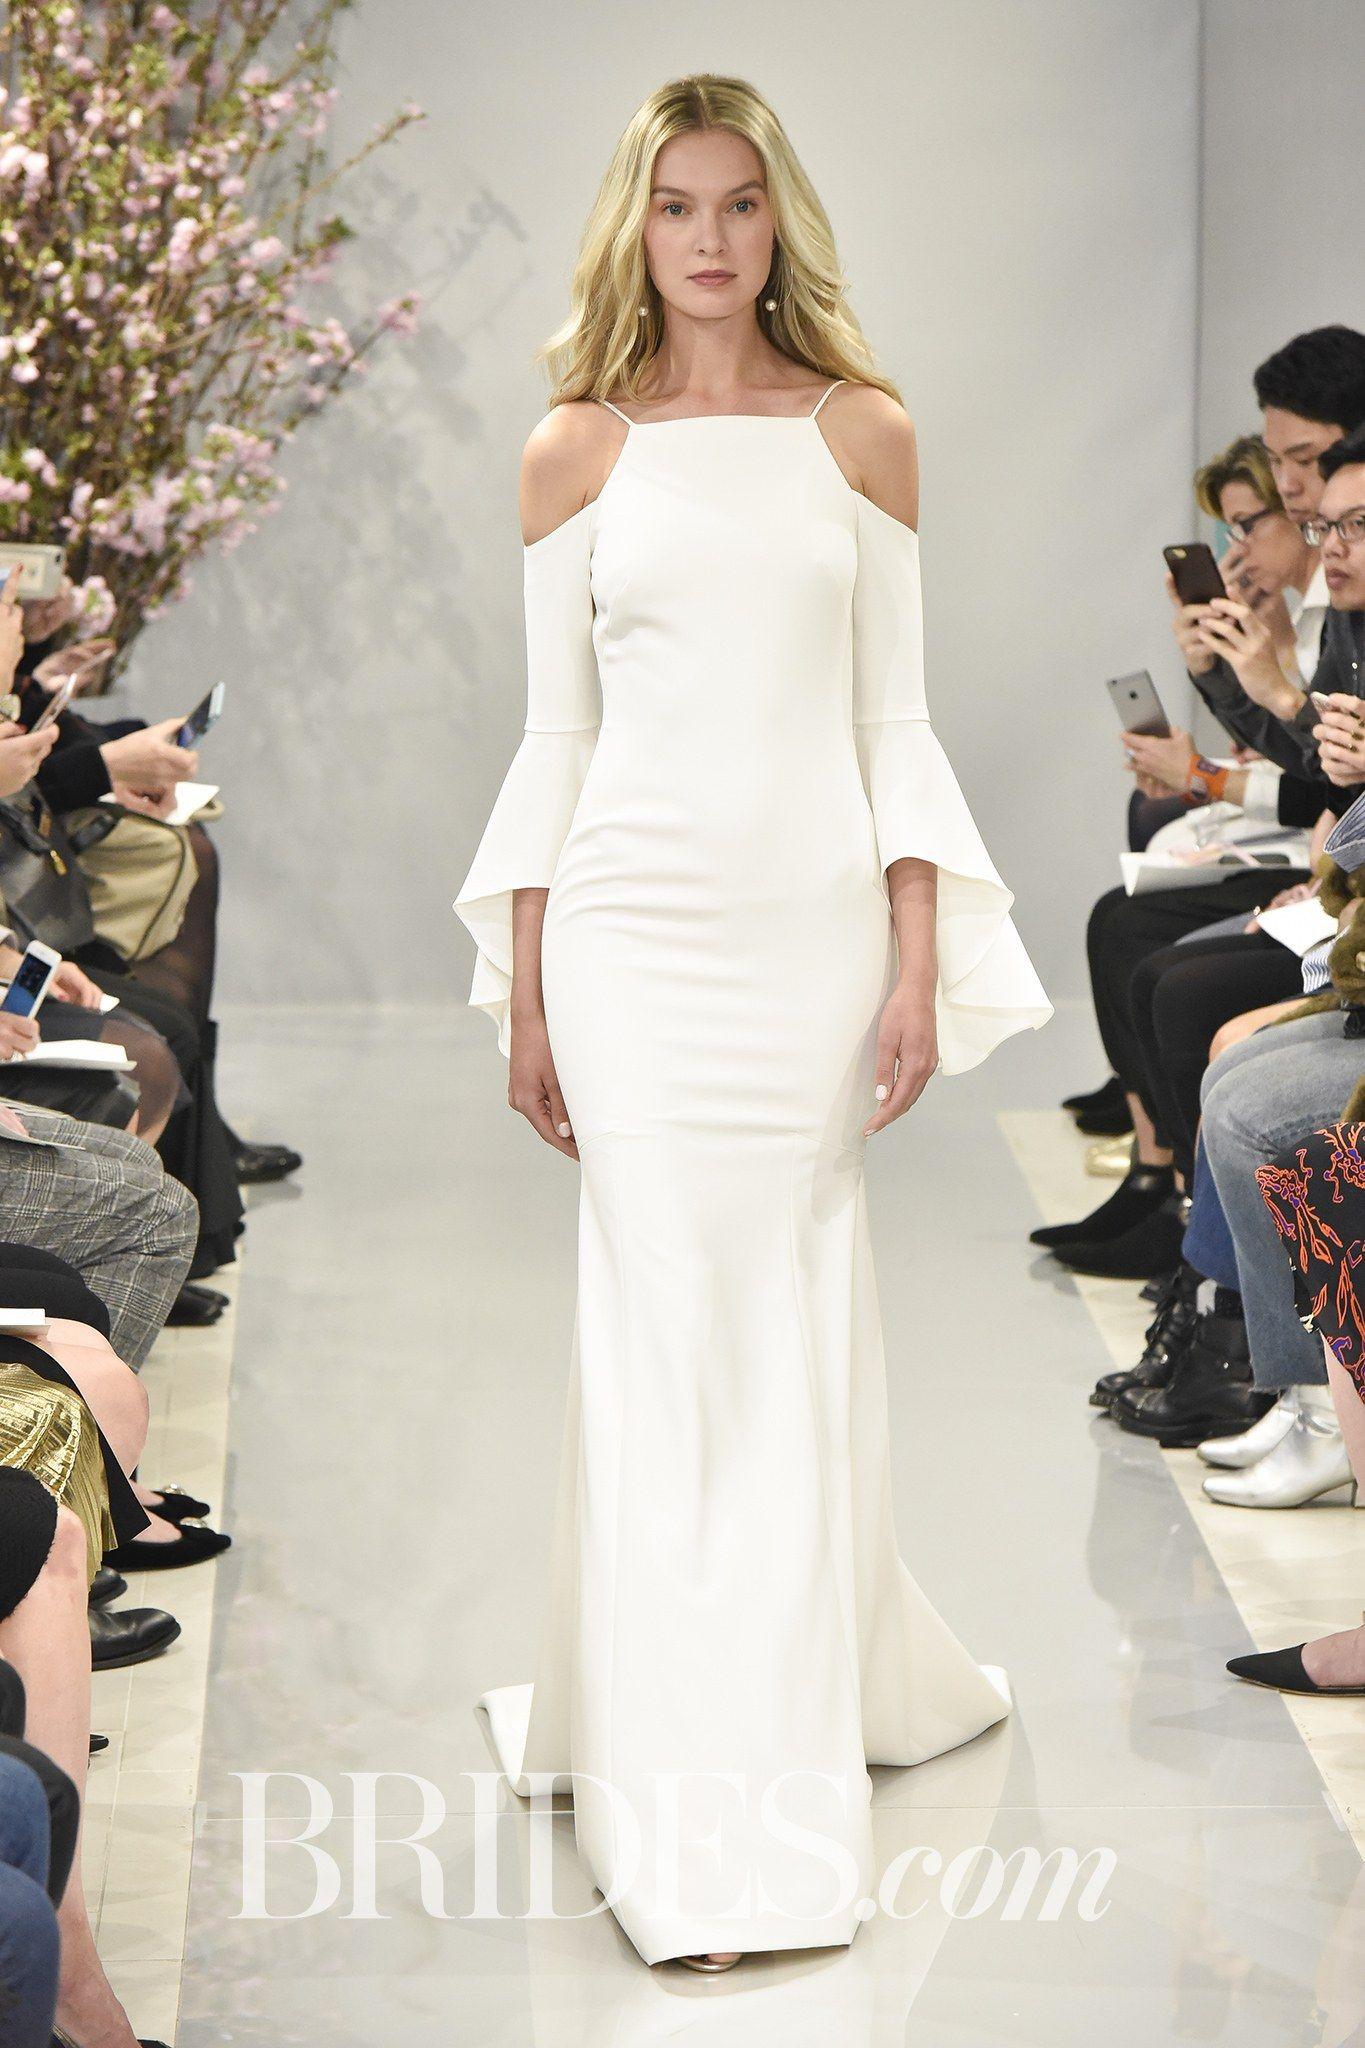 Spring wedding dress u bridal gowns trends brides brides